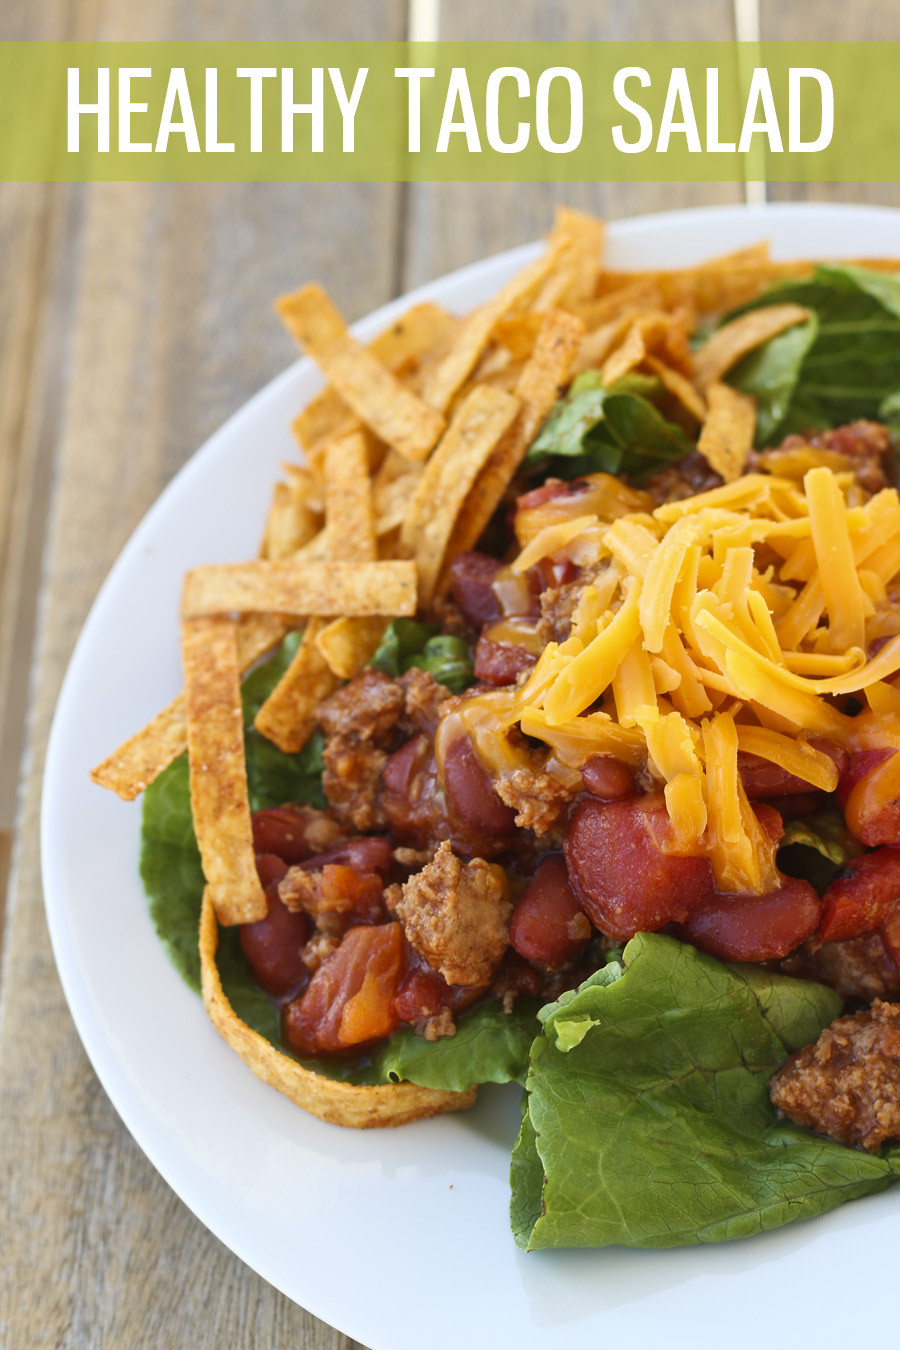 Healthy Taco Salad With Ground Turkey  Low Carb Turkey Taco Salad HoneyBear Lane